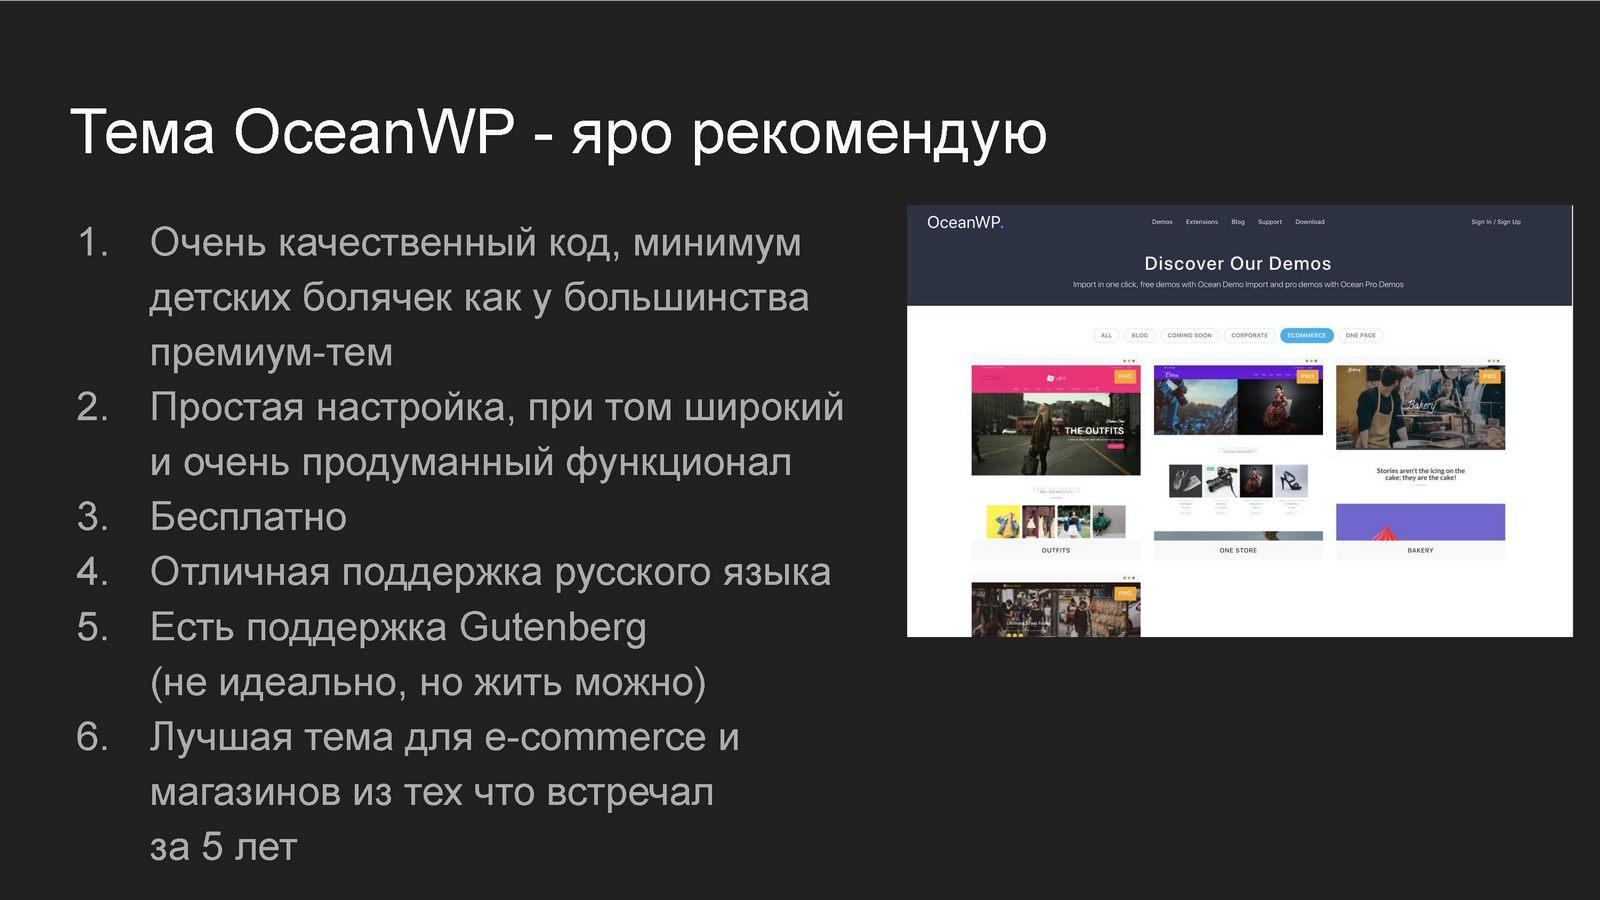 wp10-Анатолий Юмашев-Агрегатор bizzapps.ru 04